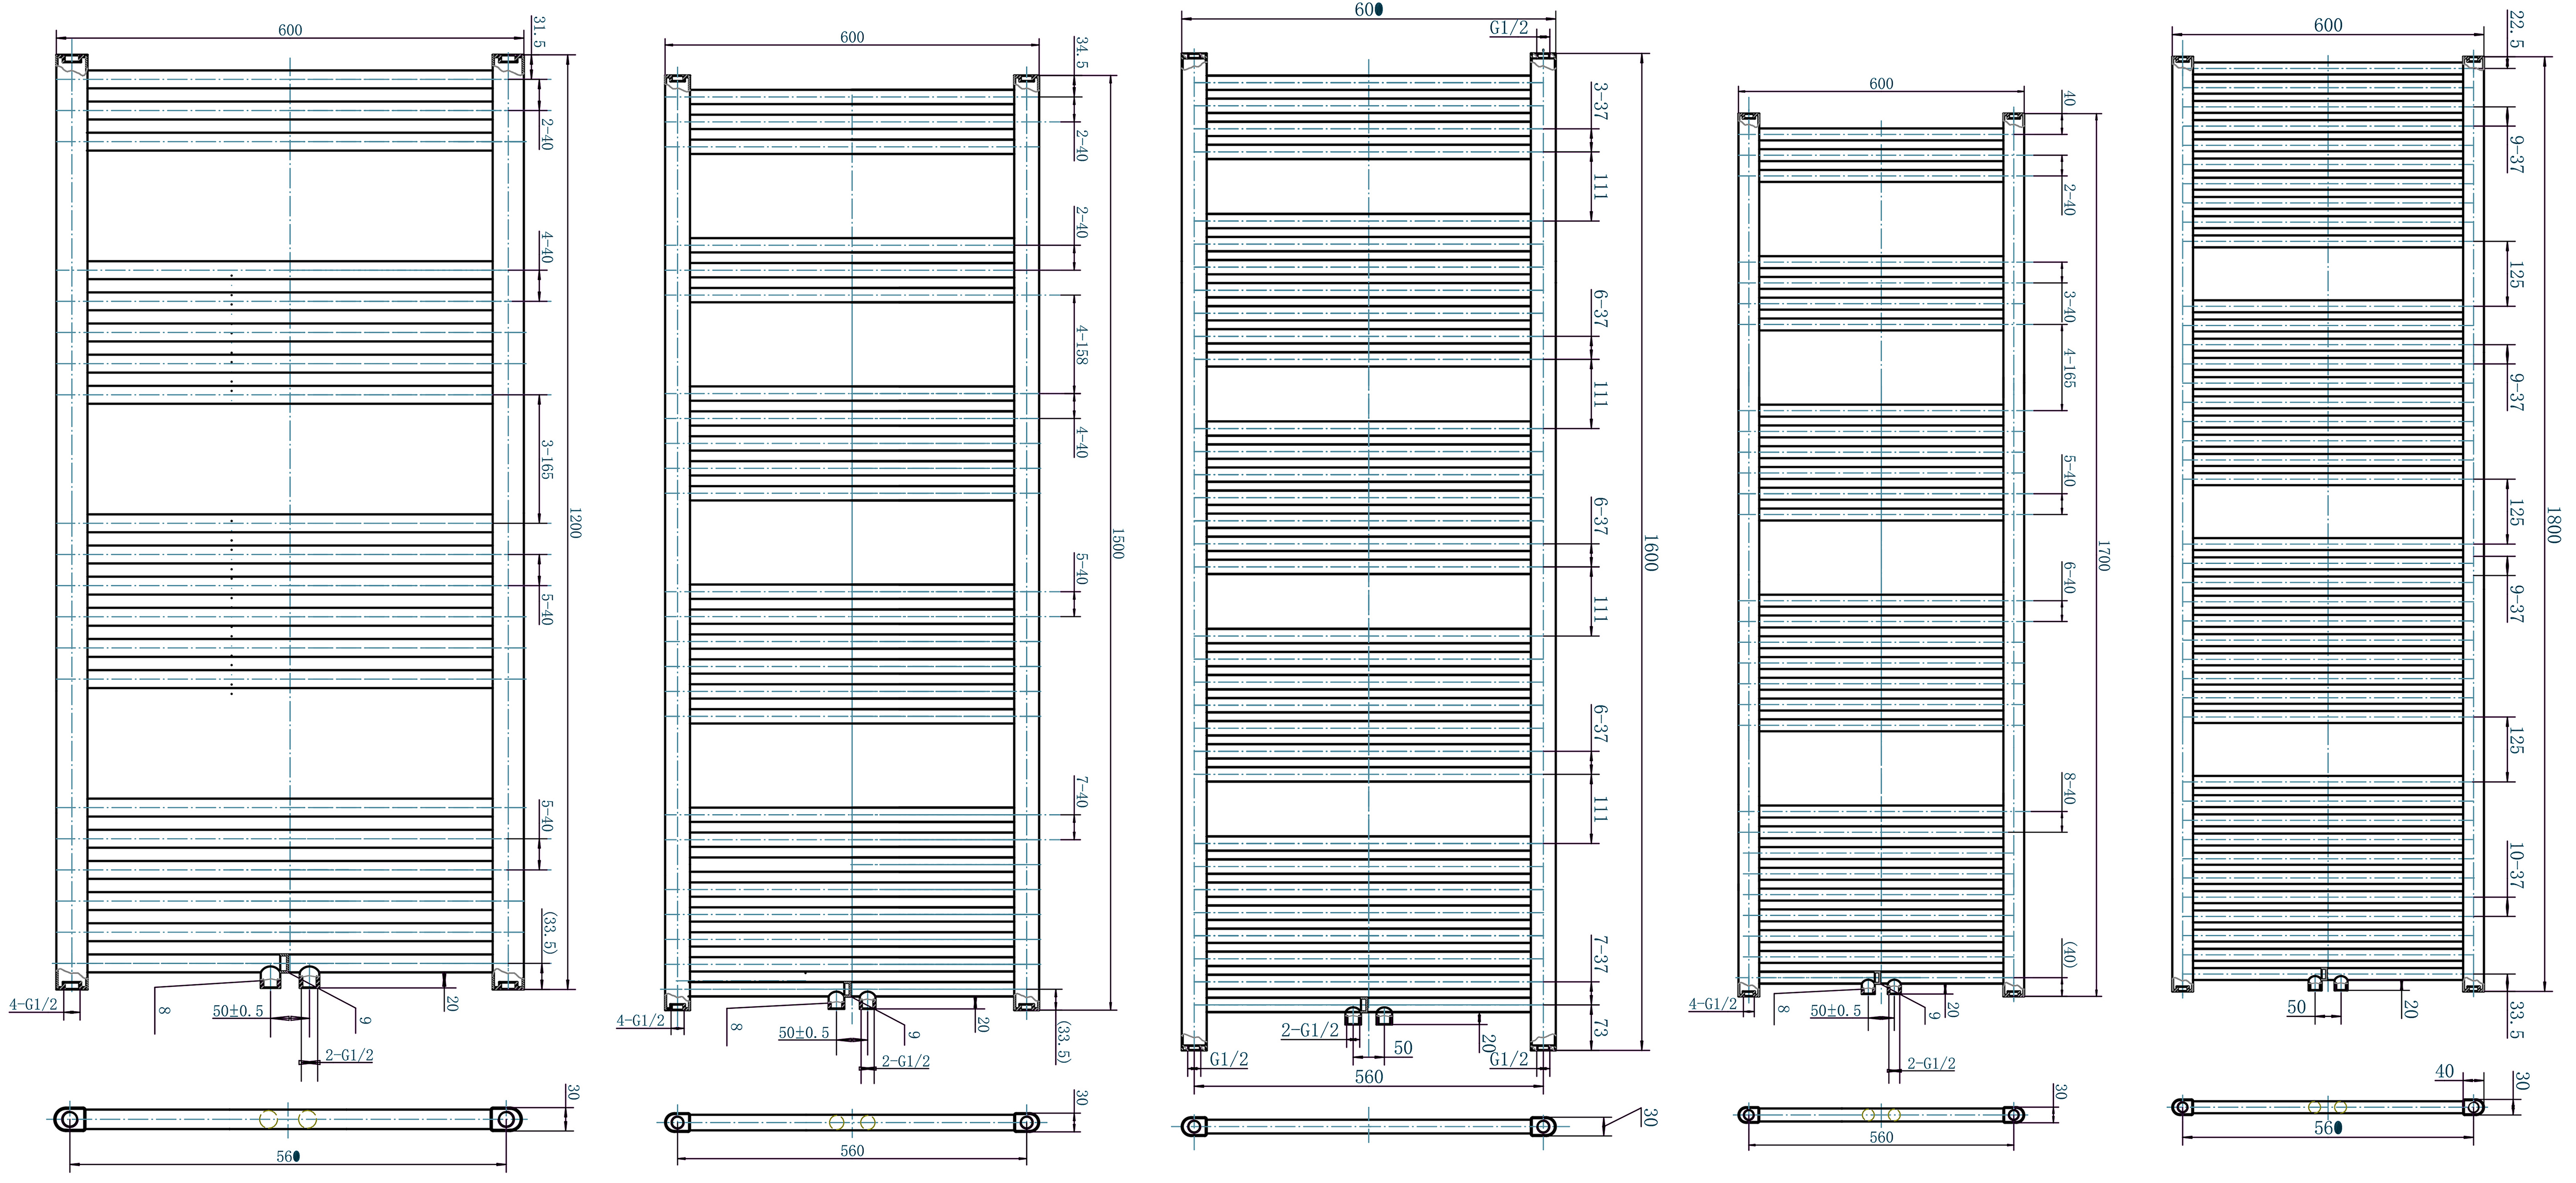 Badheizkörper R18W-A 600mm - Zeichnung